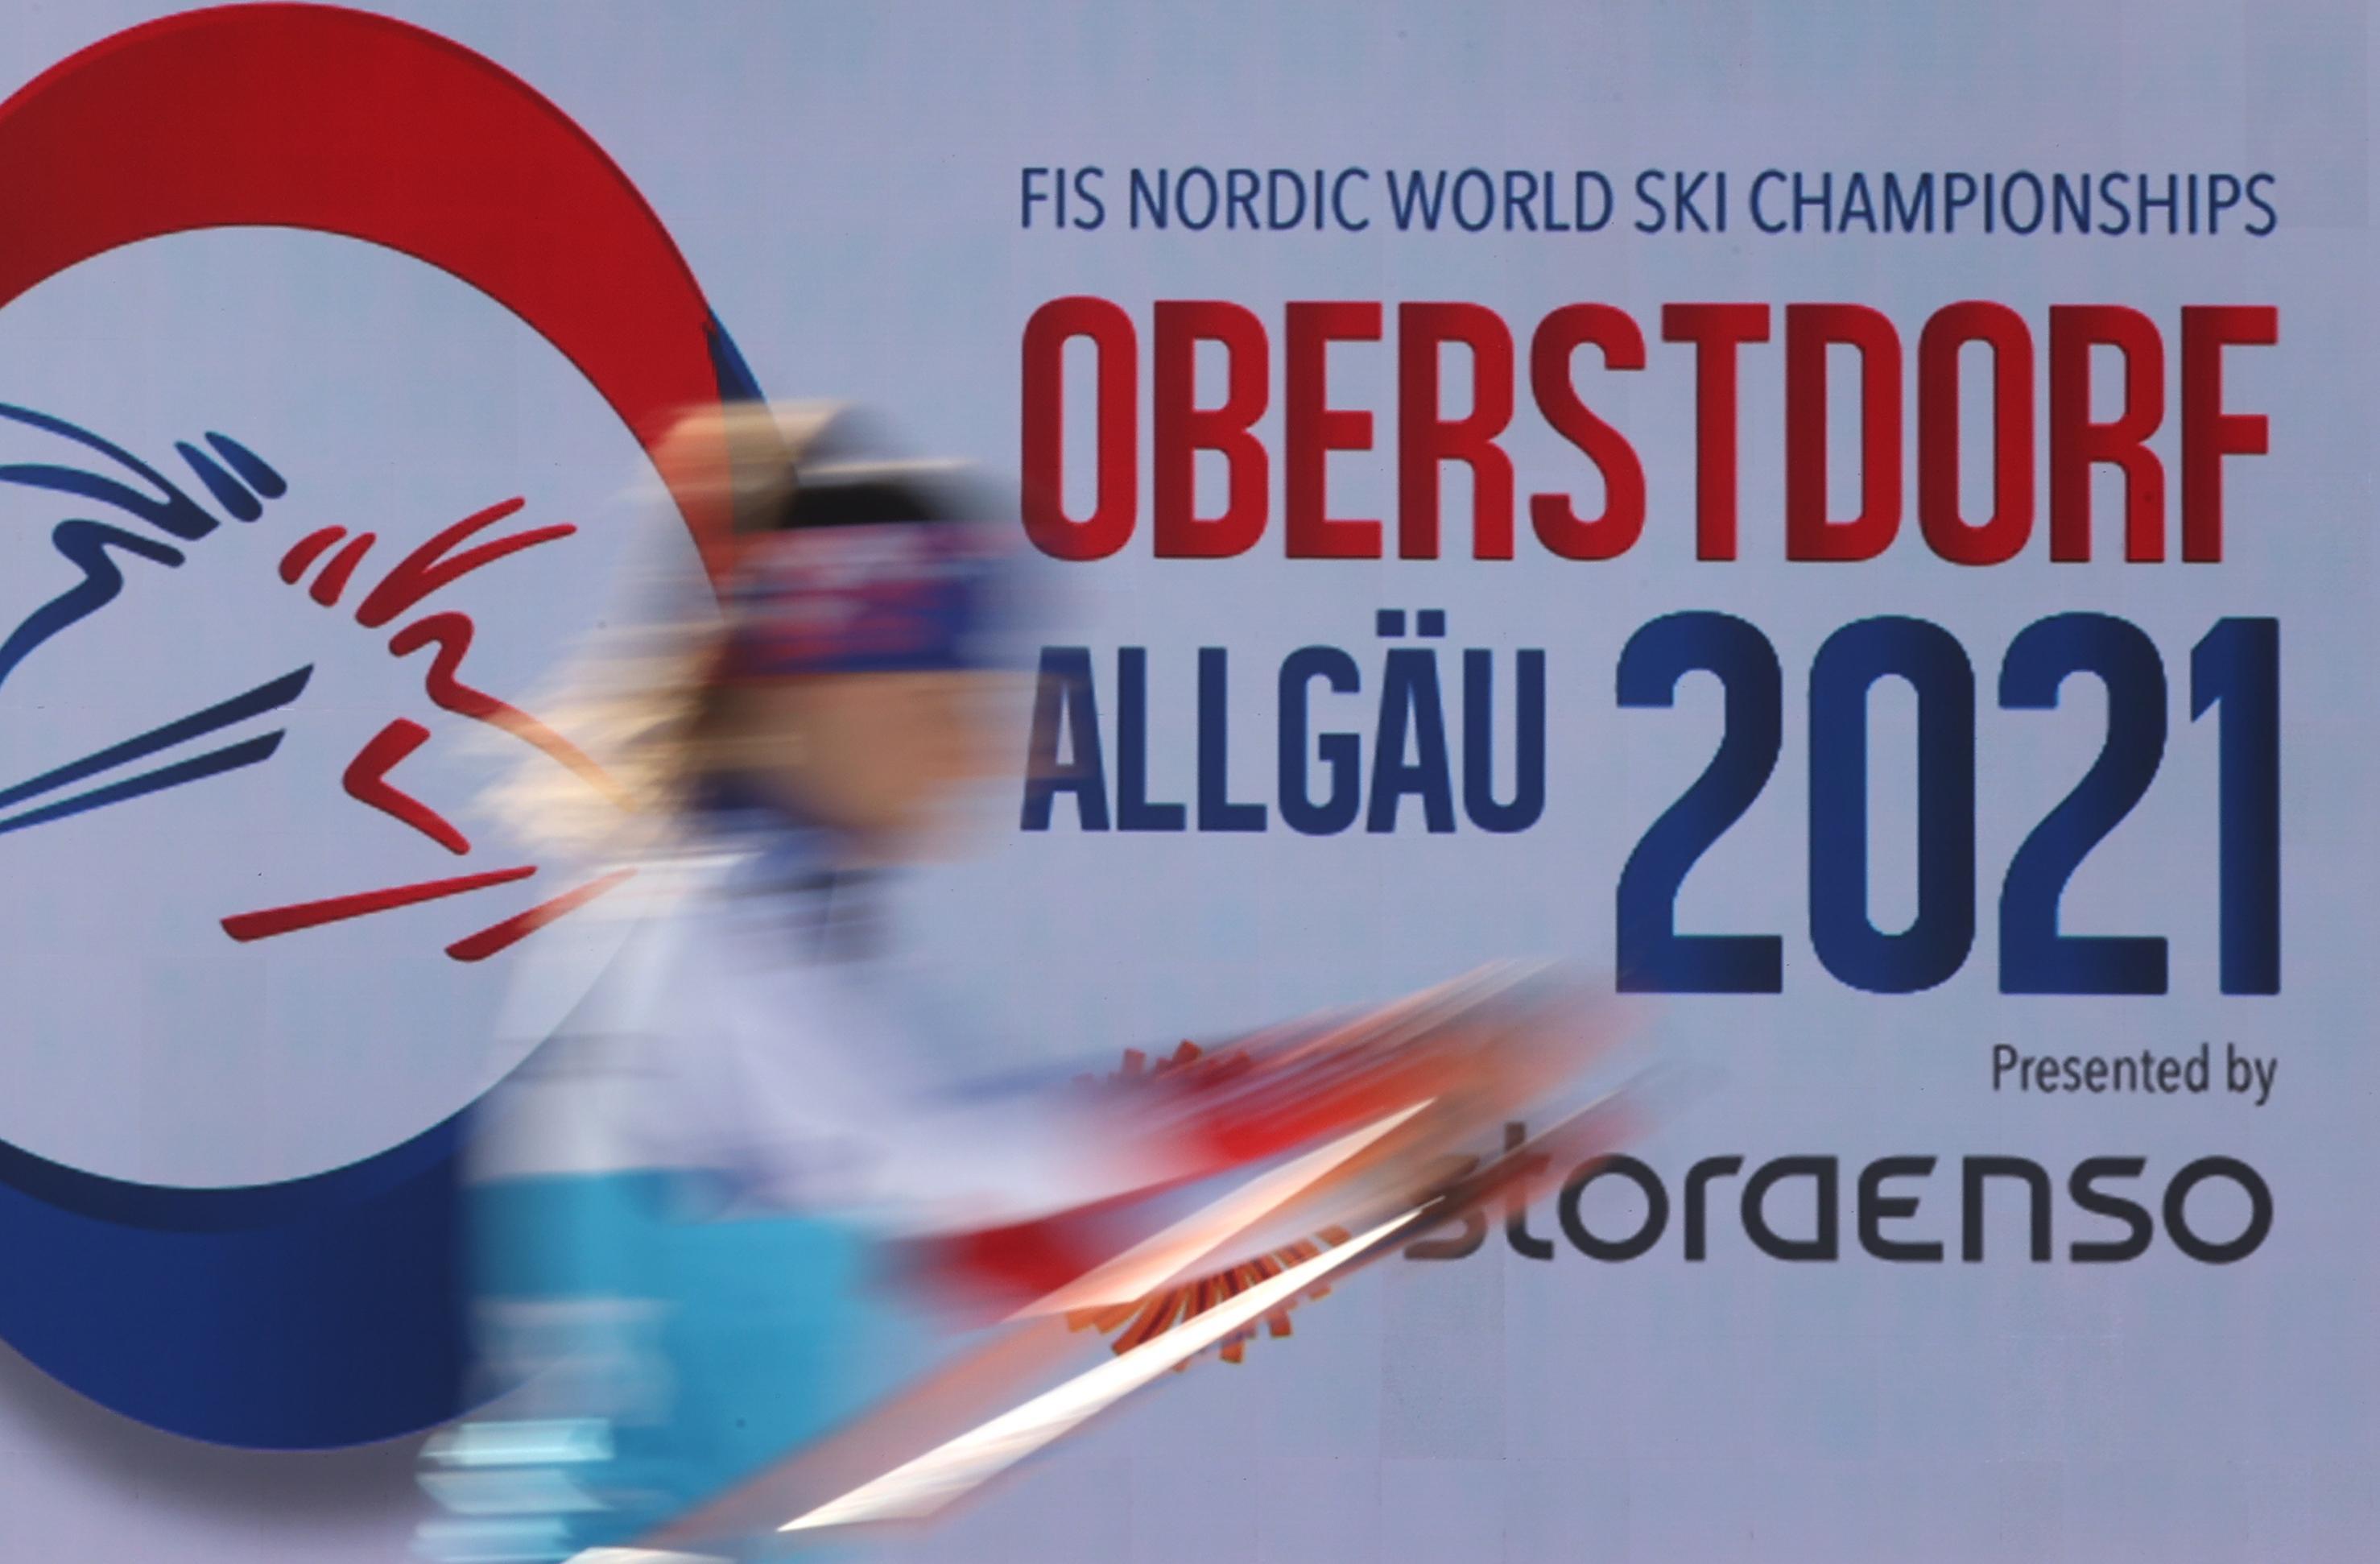 Plakat Nordische Ski-WM 2021 in Oberstdorf